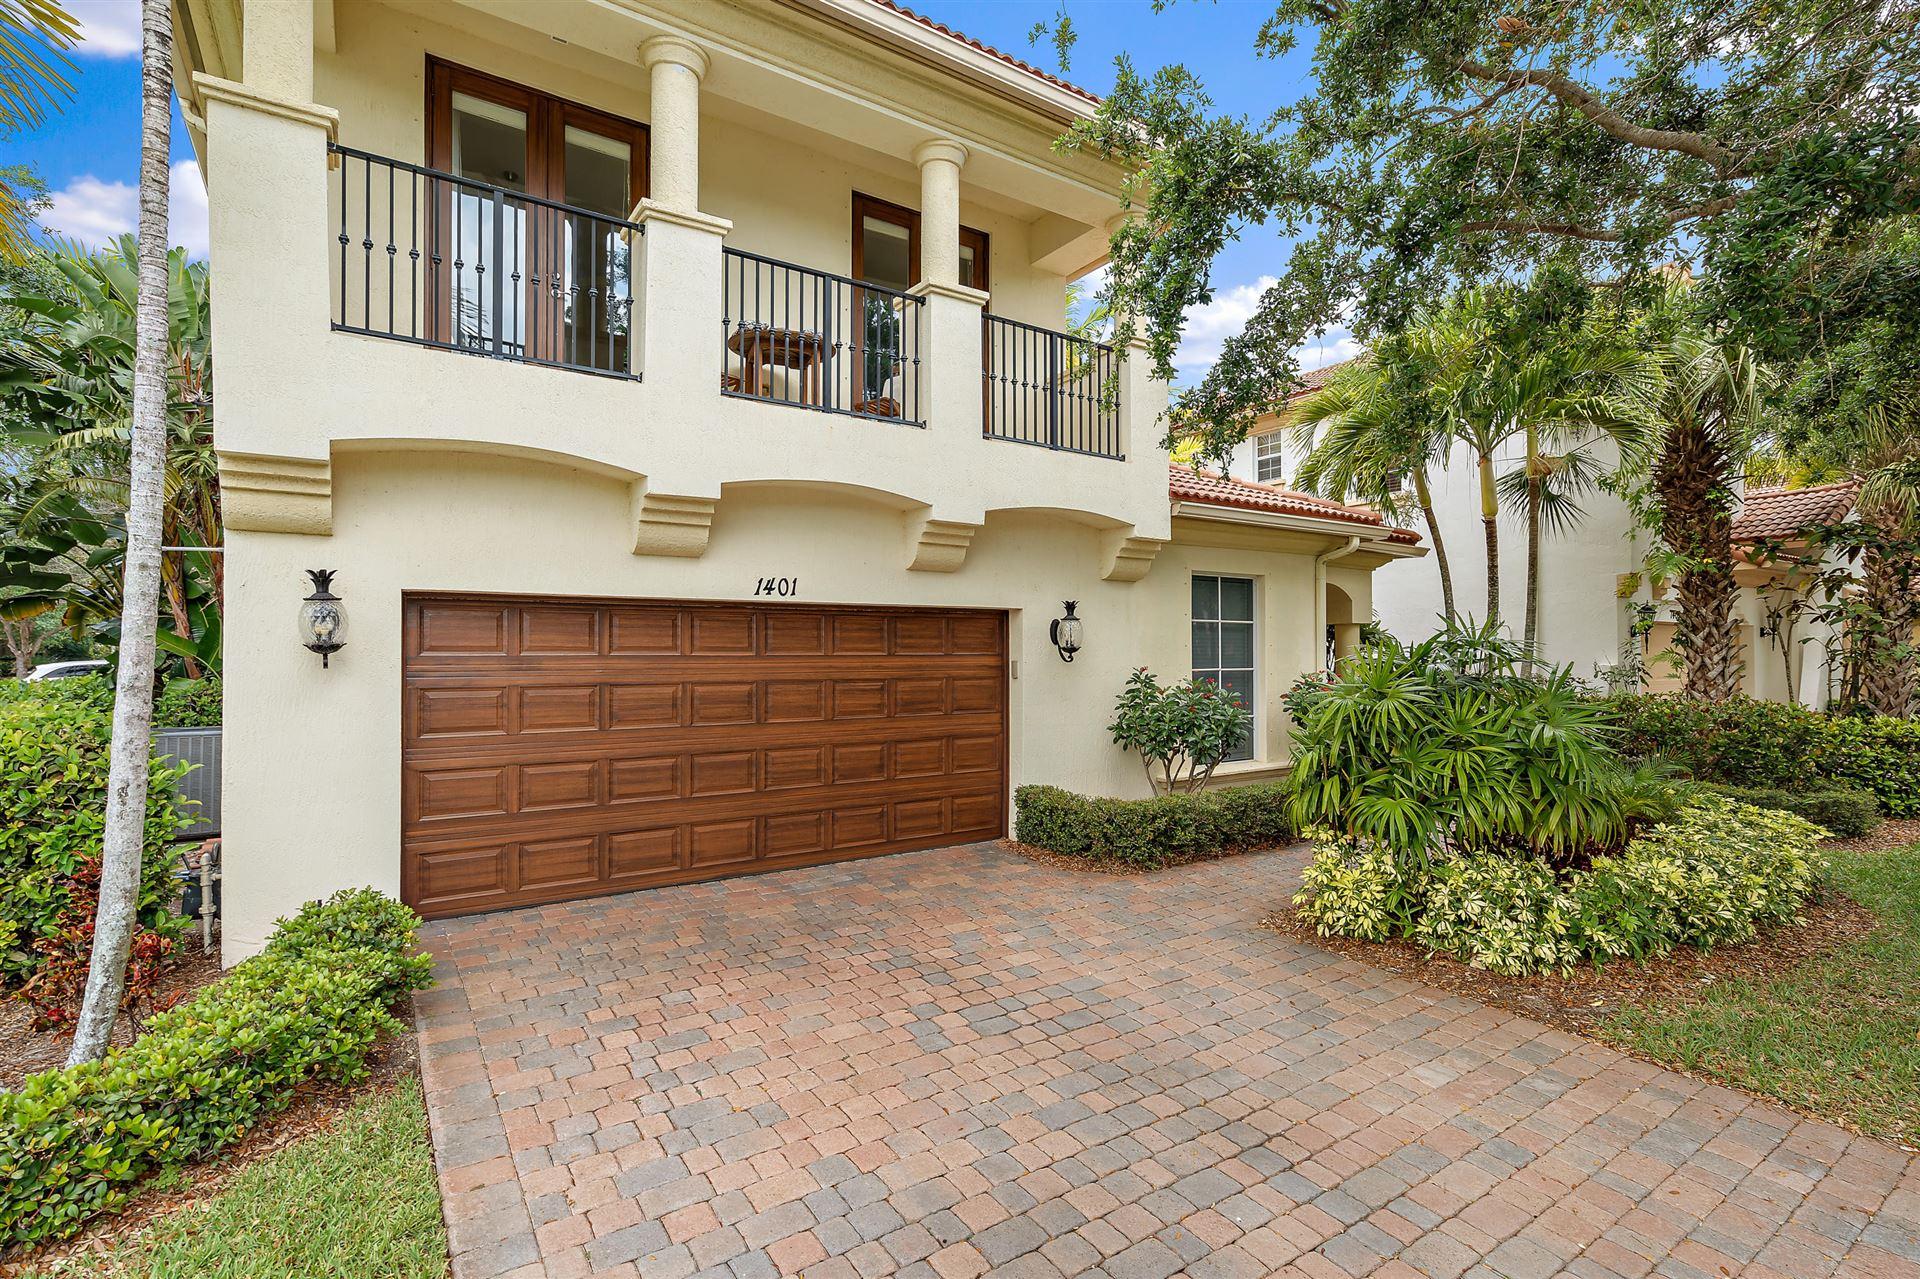 Photo of 1401 Barlow Court, Palm Beach Gardens, FL 33410 (MLS # RX-10685612)